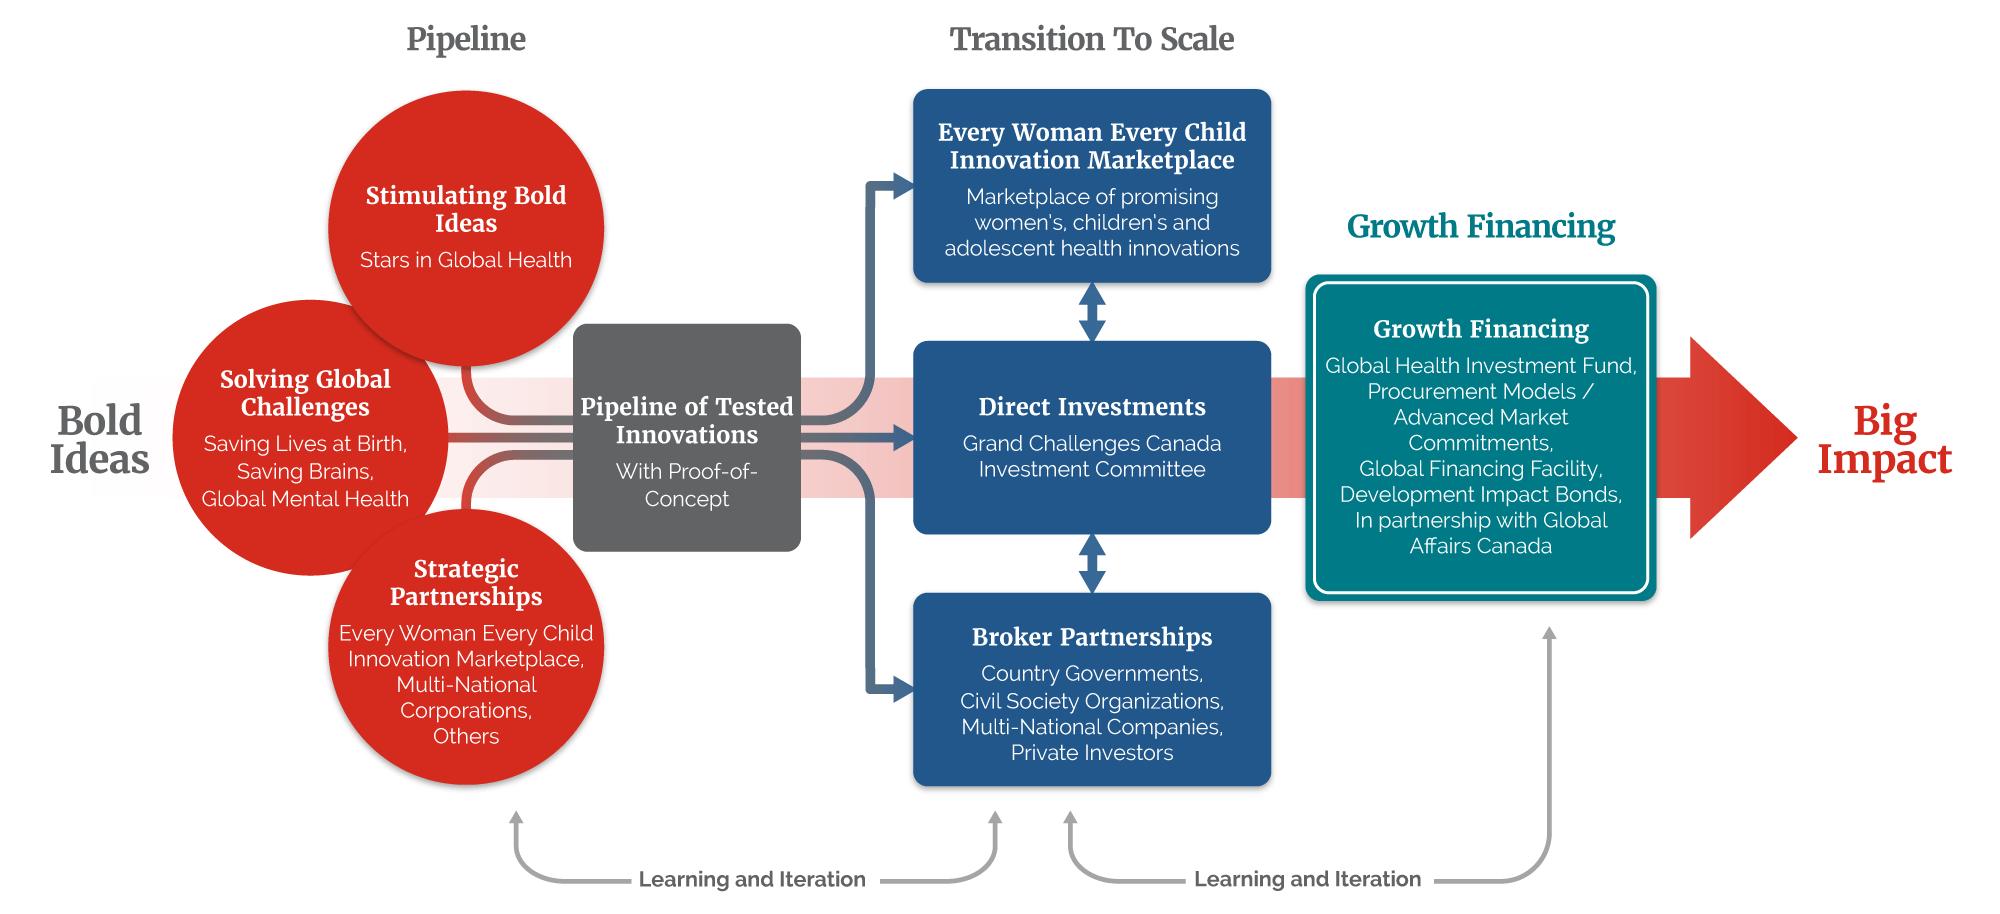 project impact diagram 2004 hyundai santa fe engine transition to scale